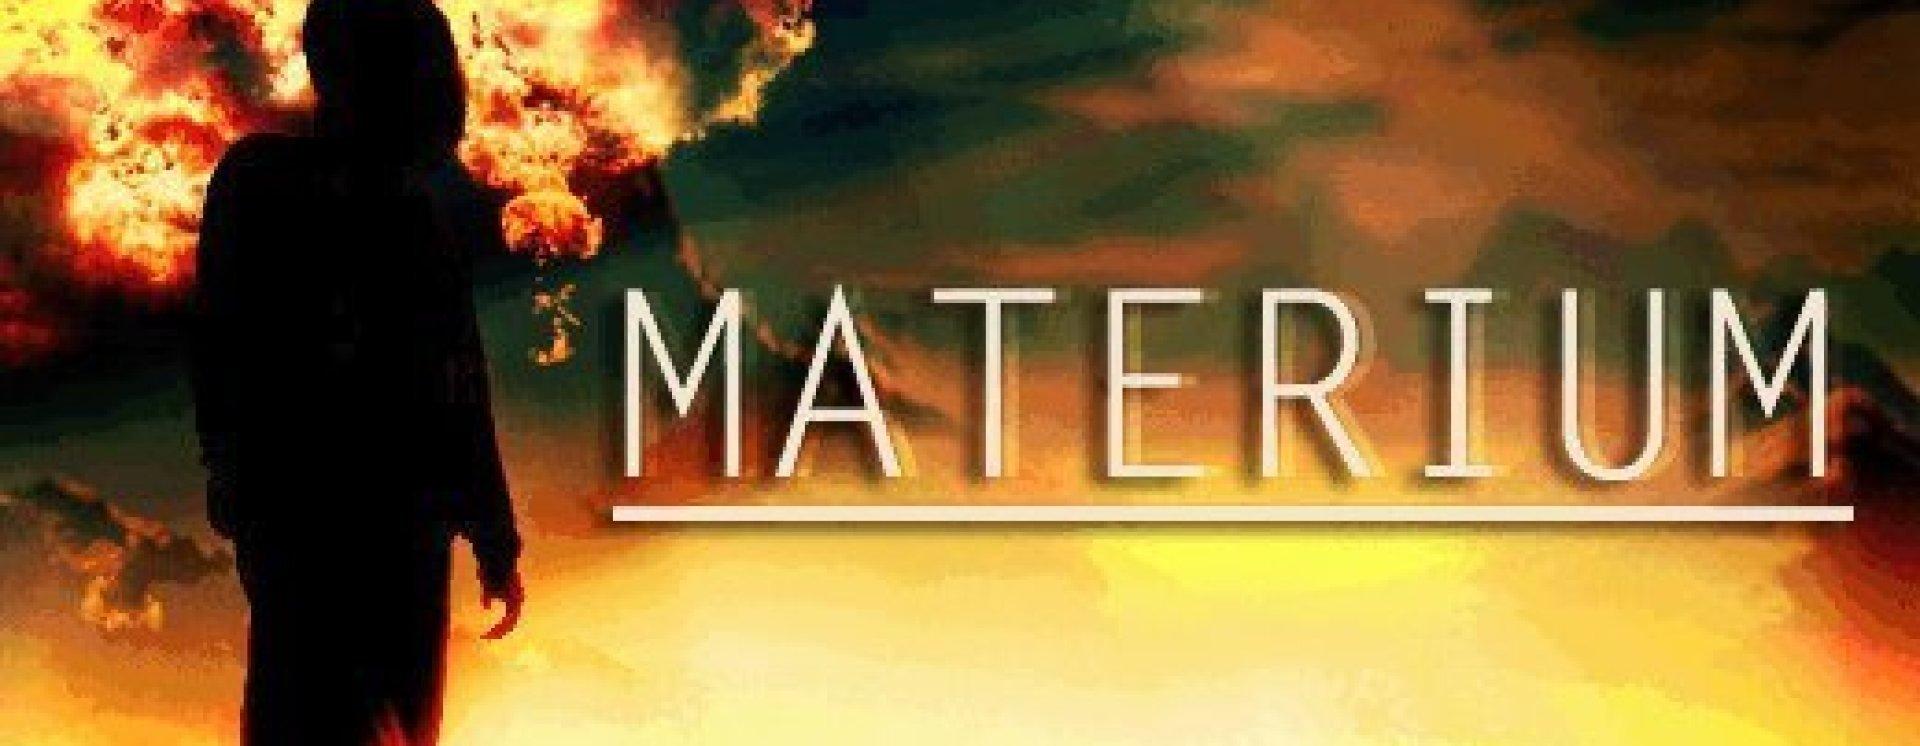 1381104298 materium fire cover copy